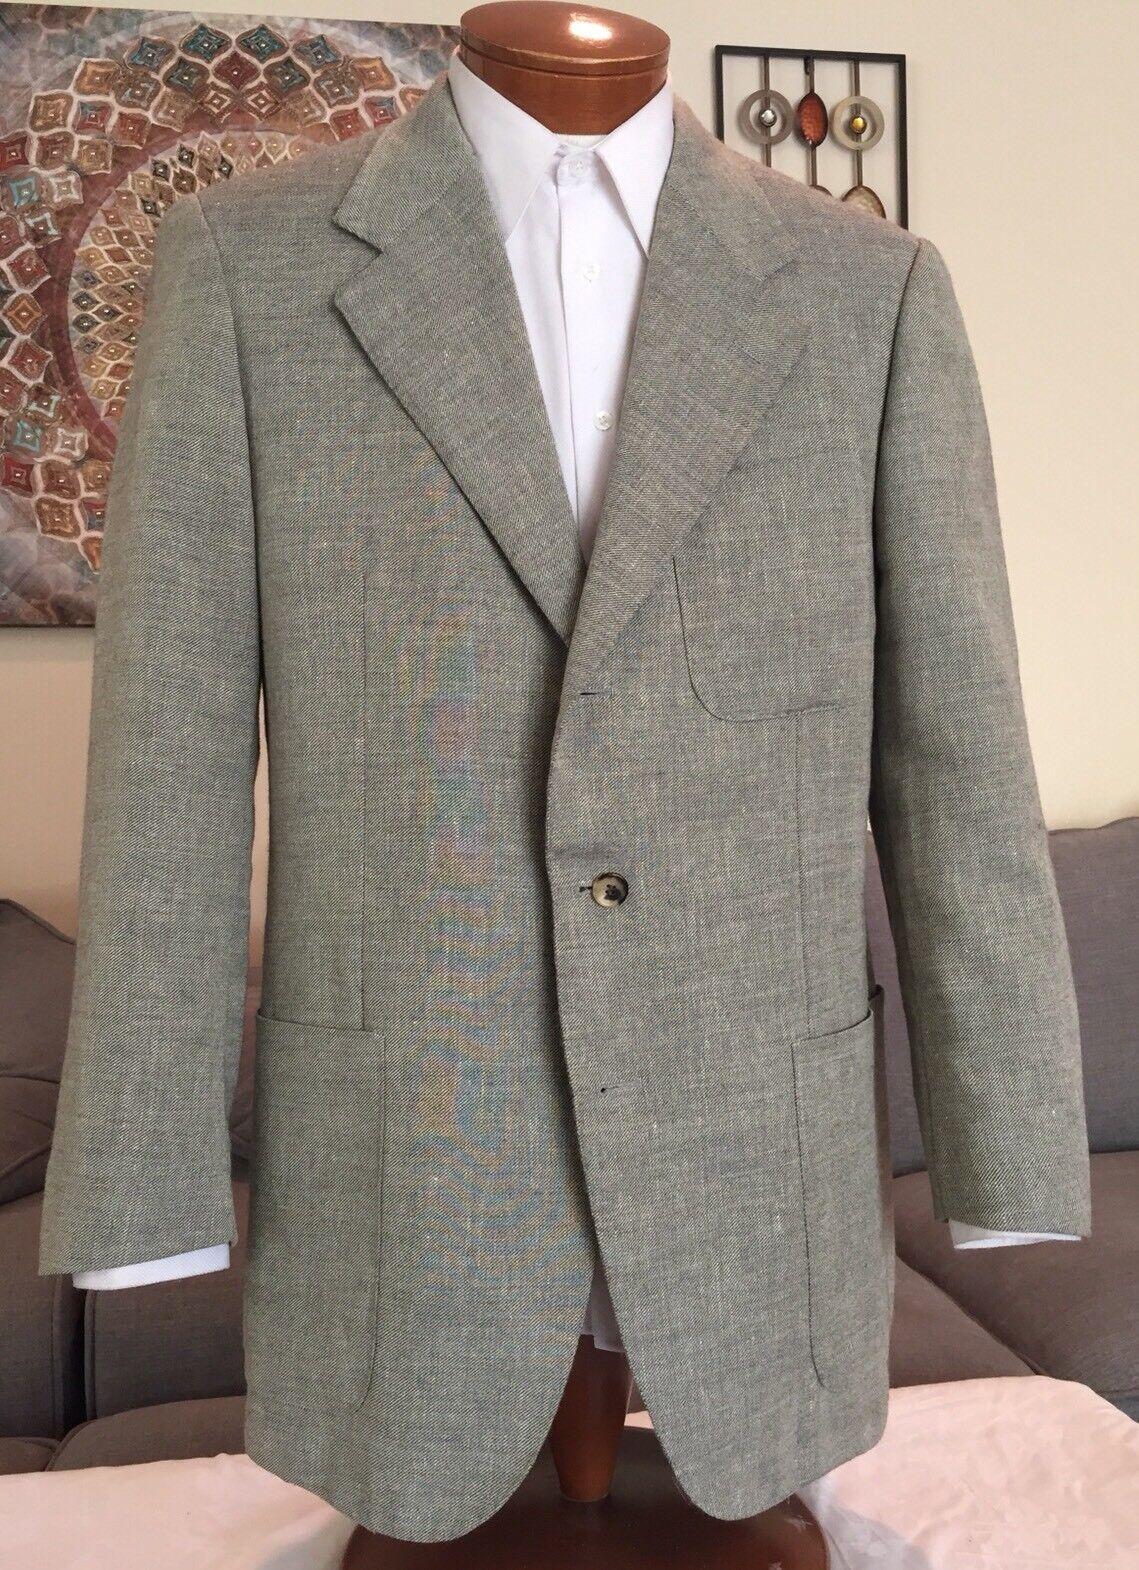 Stunning NEW Sulka Mens Beige Alpaca Flax Cotton 3 Btn Dual Vent Blazer Sz 44 R